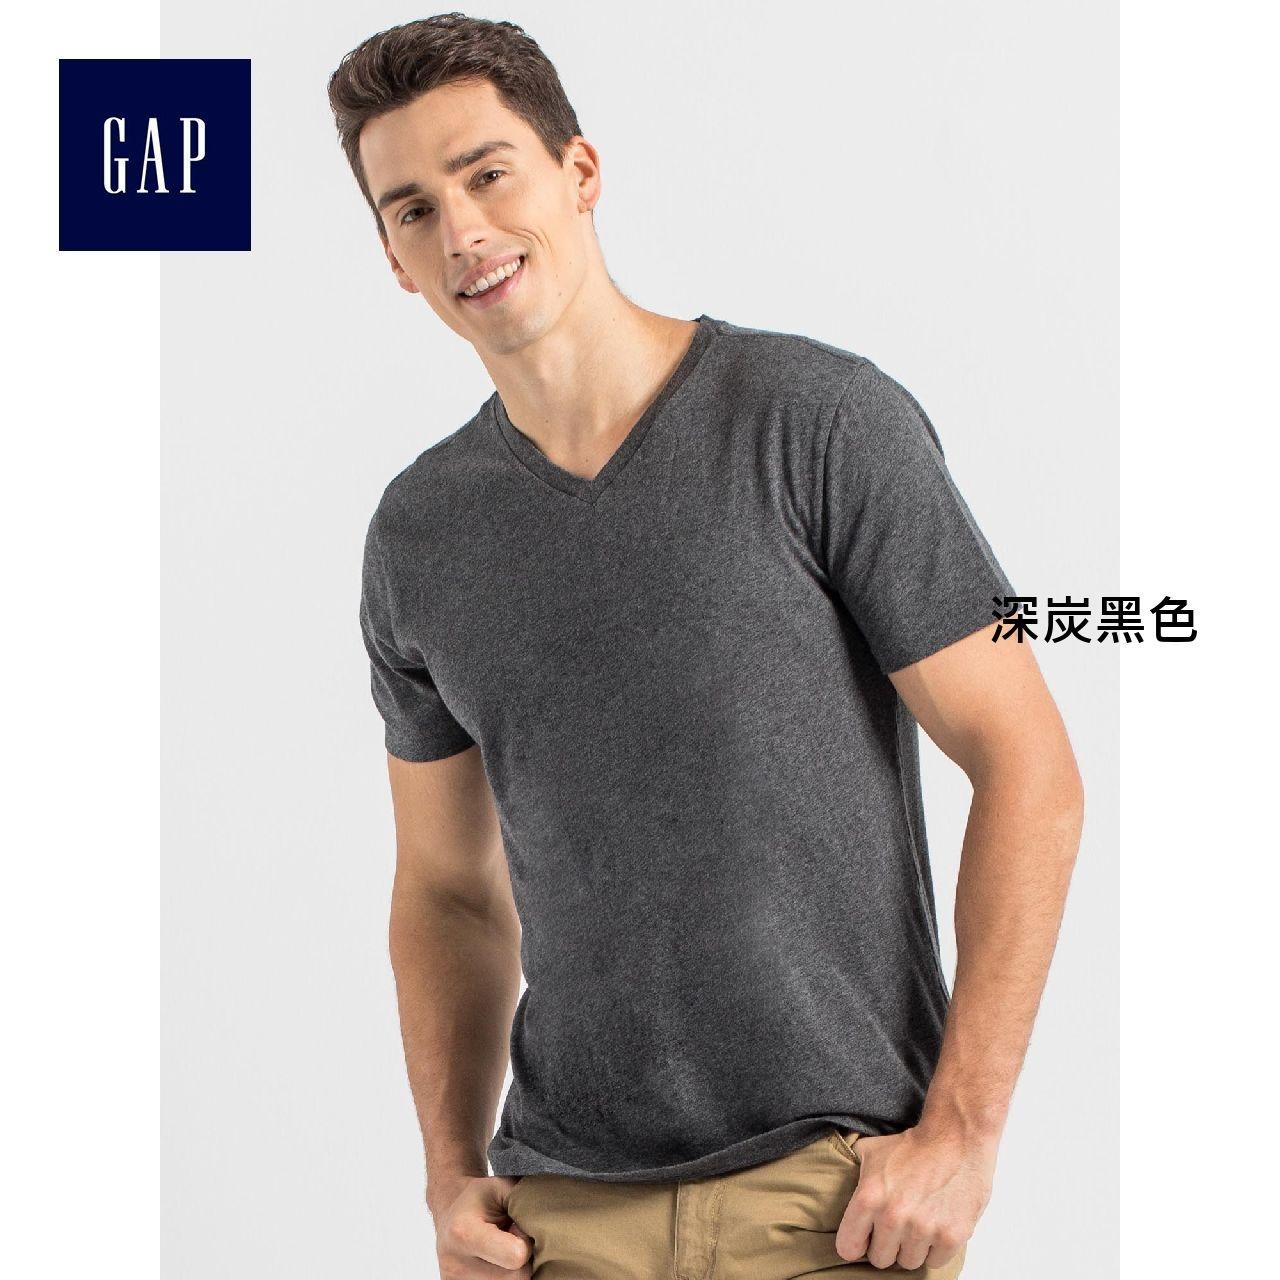 Gap男裝 全棉多選色基本款純色V領T恤 768638